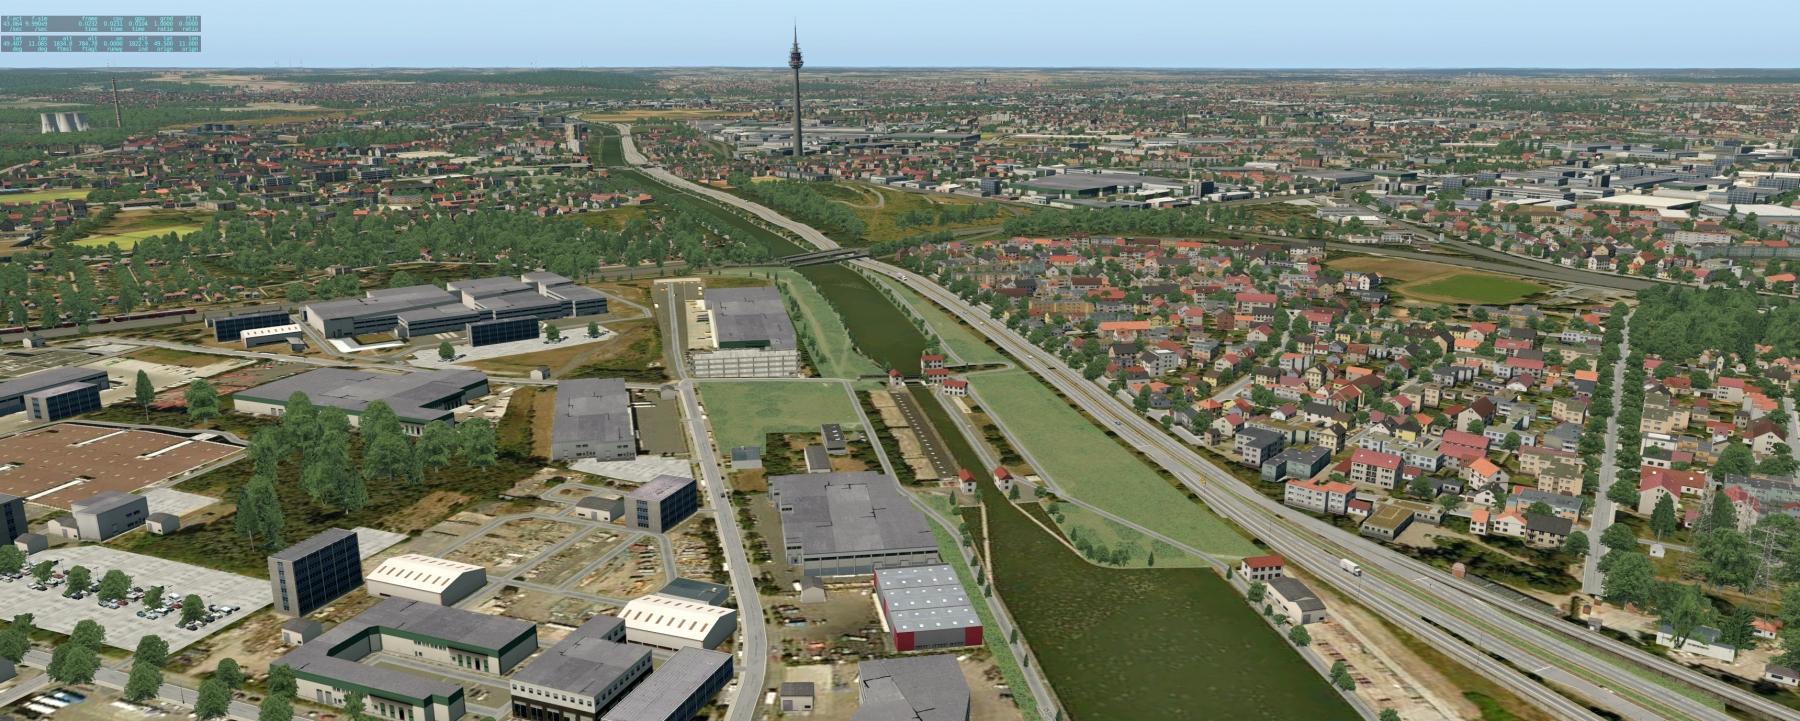 DE Nuremberg